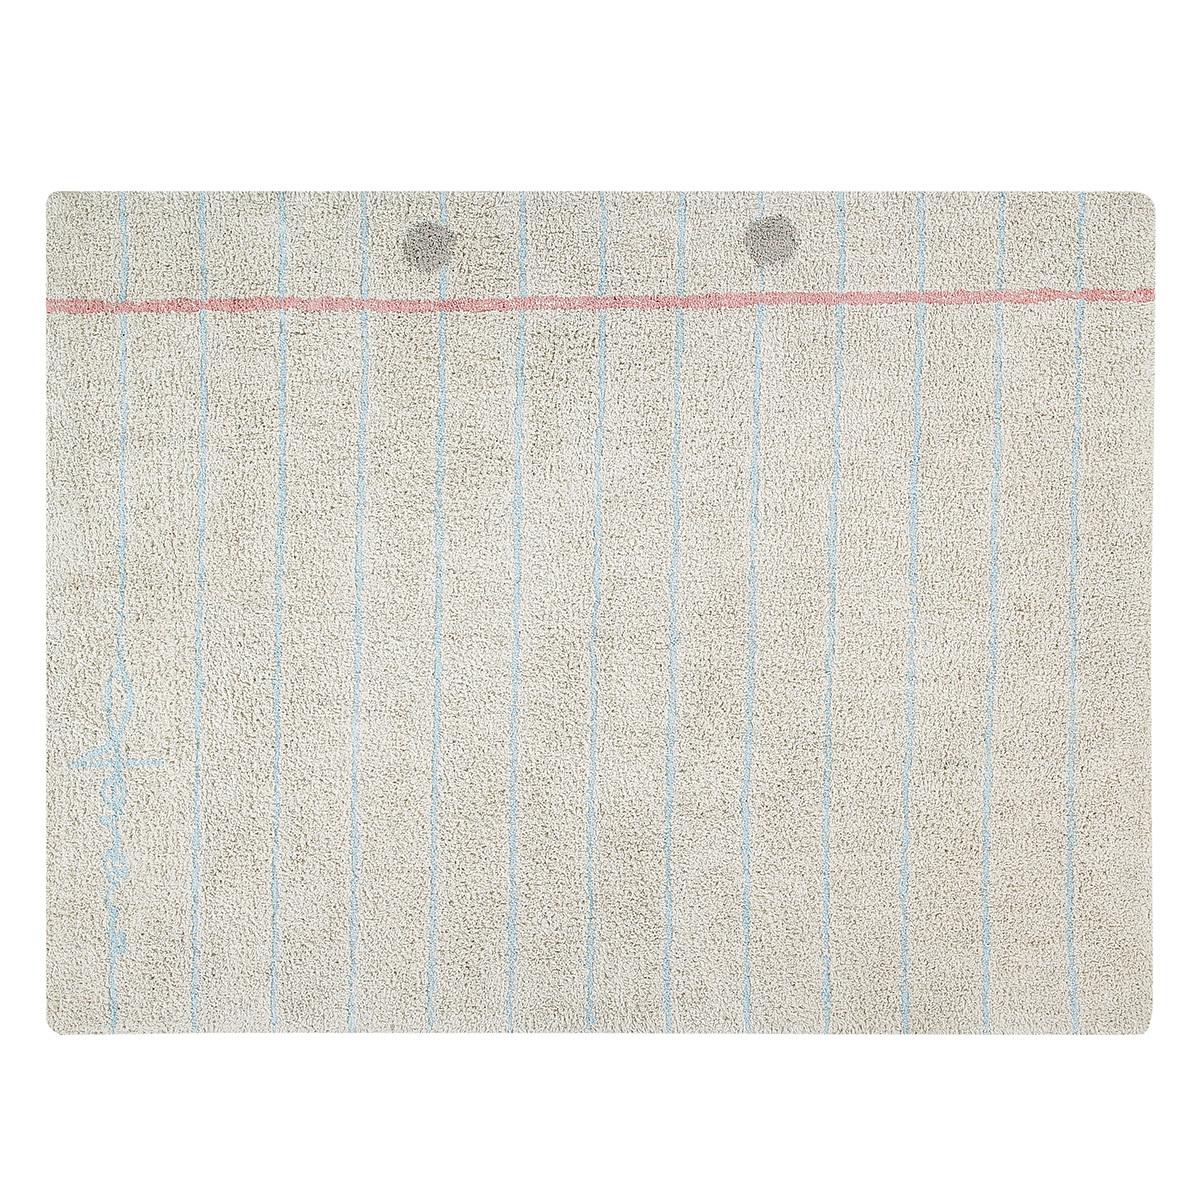 Tapis Tapis Lavable Notebook - 120 x 160 cm